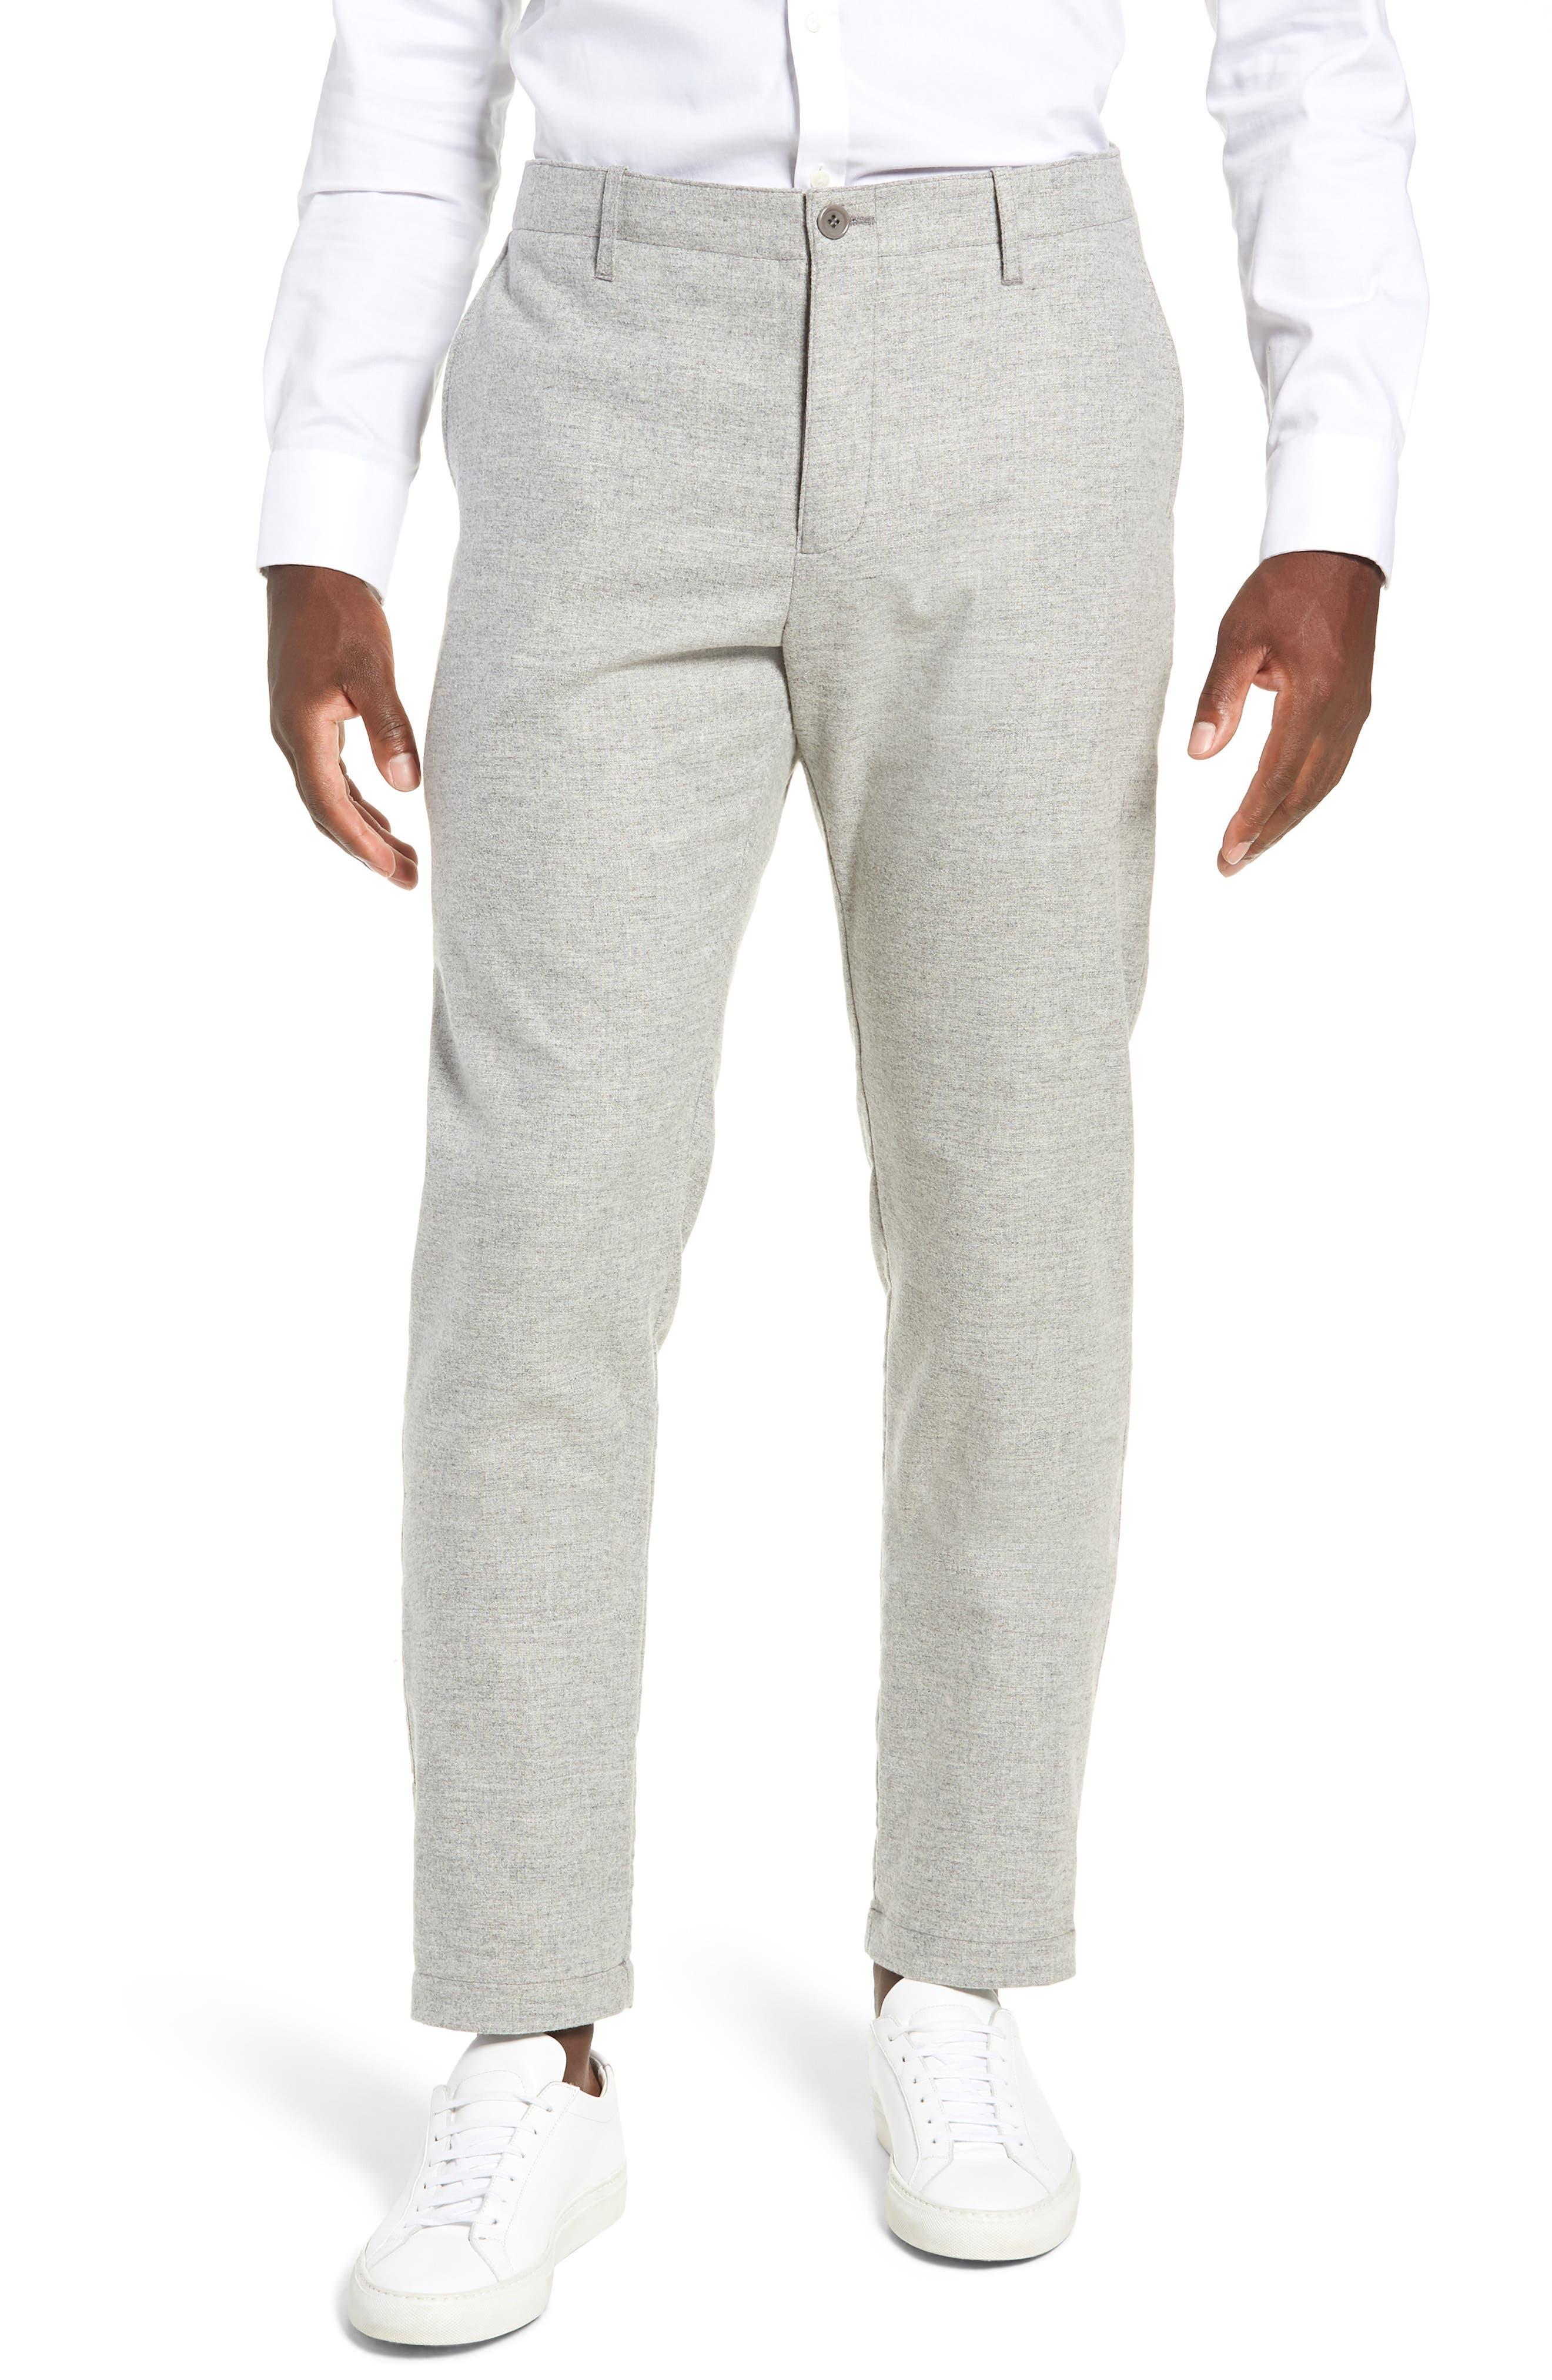 DJVU Slim Fit Trousers,                         Main,                         color, 027